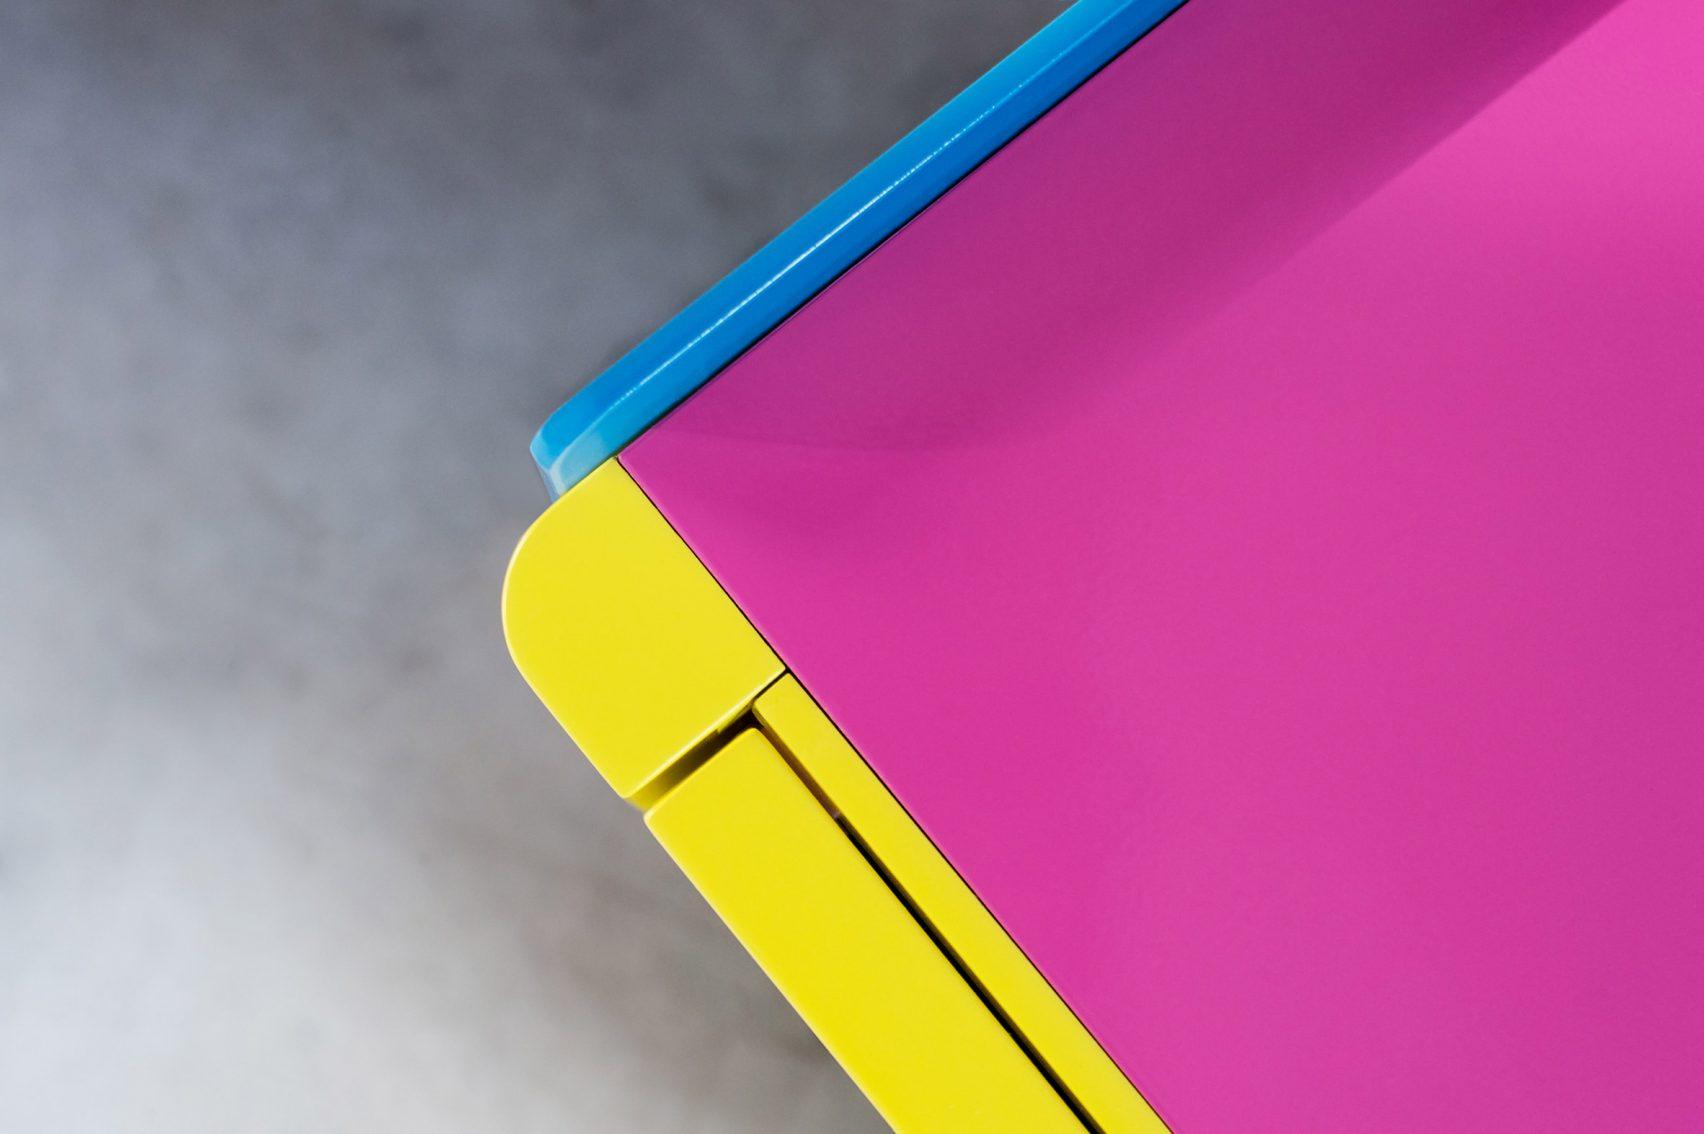 nakano-twins-adam-nathaniel-furman-furniture-design_dezeen_2364_col_5-1704x1134.jpg